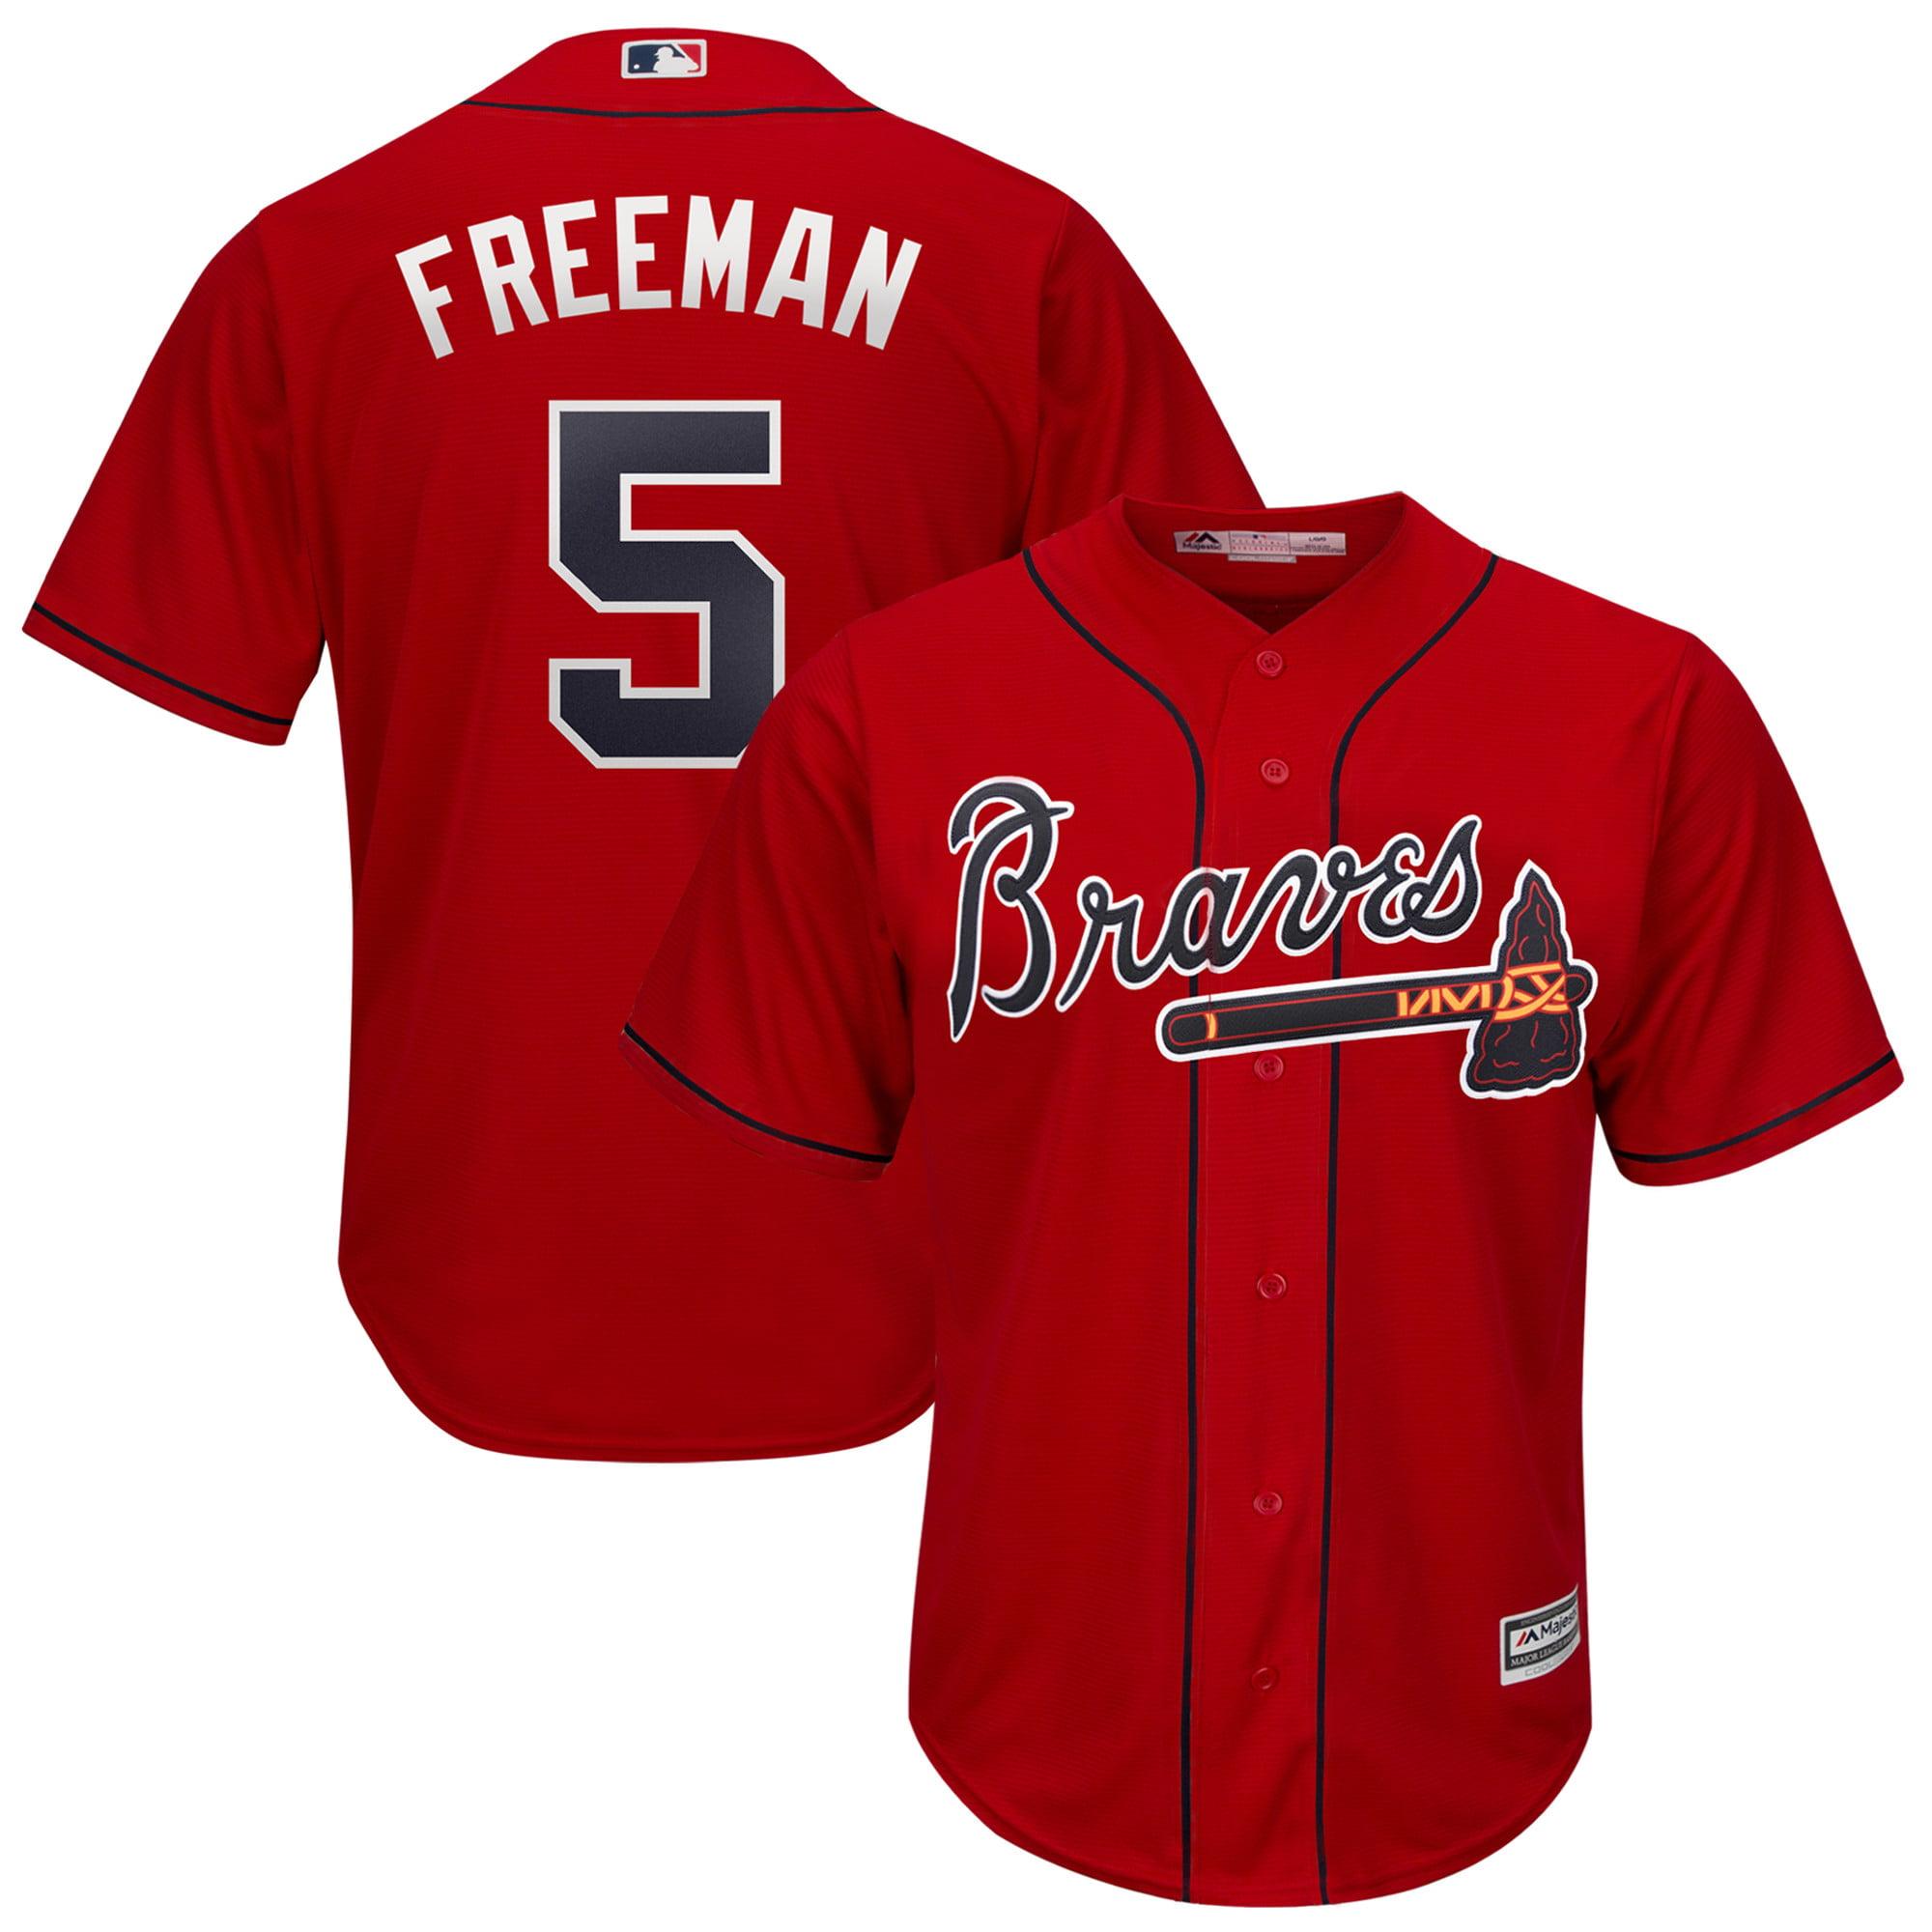 Freddie Freeman Atlanta Braves Majestic 2019 Alternate Official Cool Base Player Jersey - Scarlet